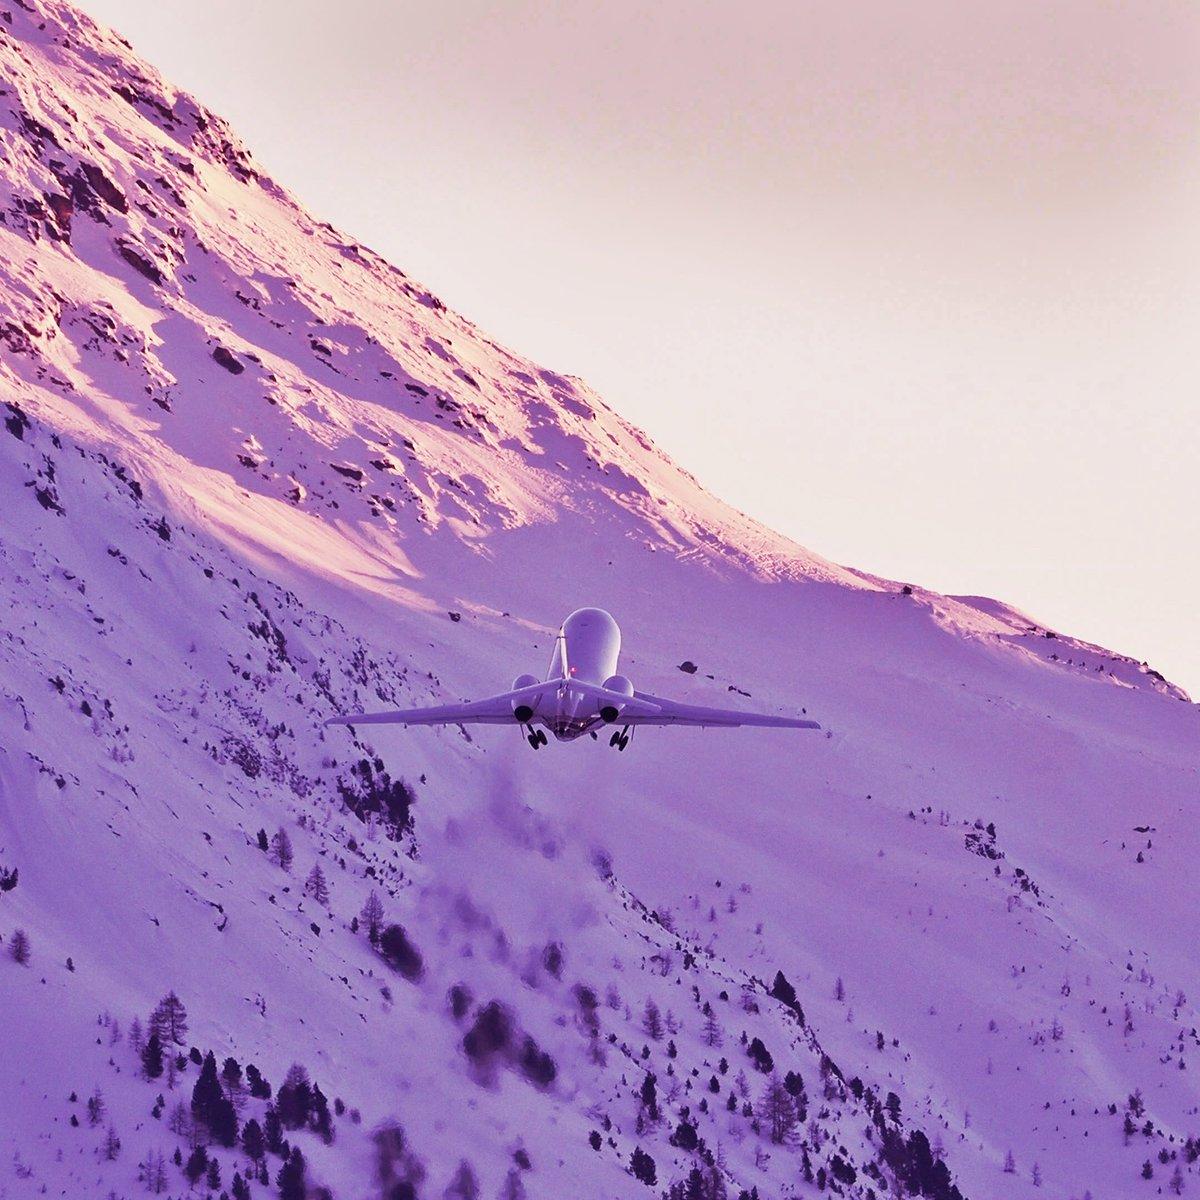 Engadin Airport  Dassault Falcon Special Part 3 https://youtu.be/N9BWGWurxX0 ... #csdlb #NetJetsEurope #netjets #falcon2000ex #dassault #falcon #privatejet #corporatejets #businessjet #planespotting #lszs #EngadinAirport #samedanaiport #stmoritz #valleytakeoff #mountains #tiltshift